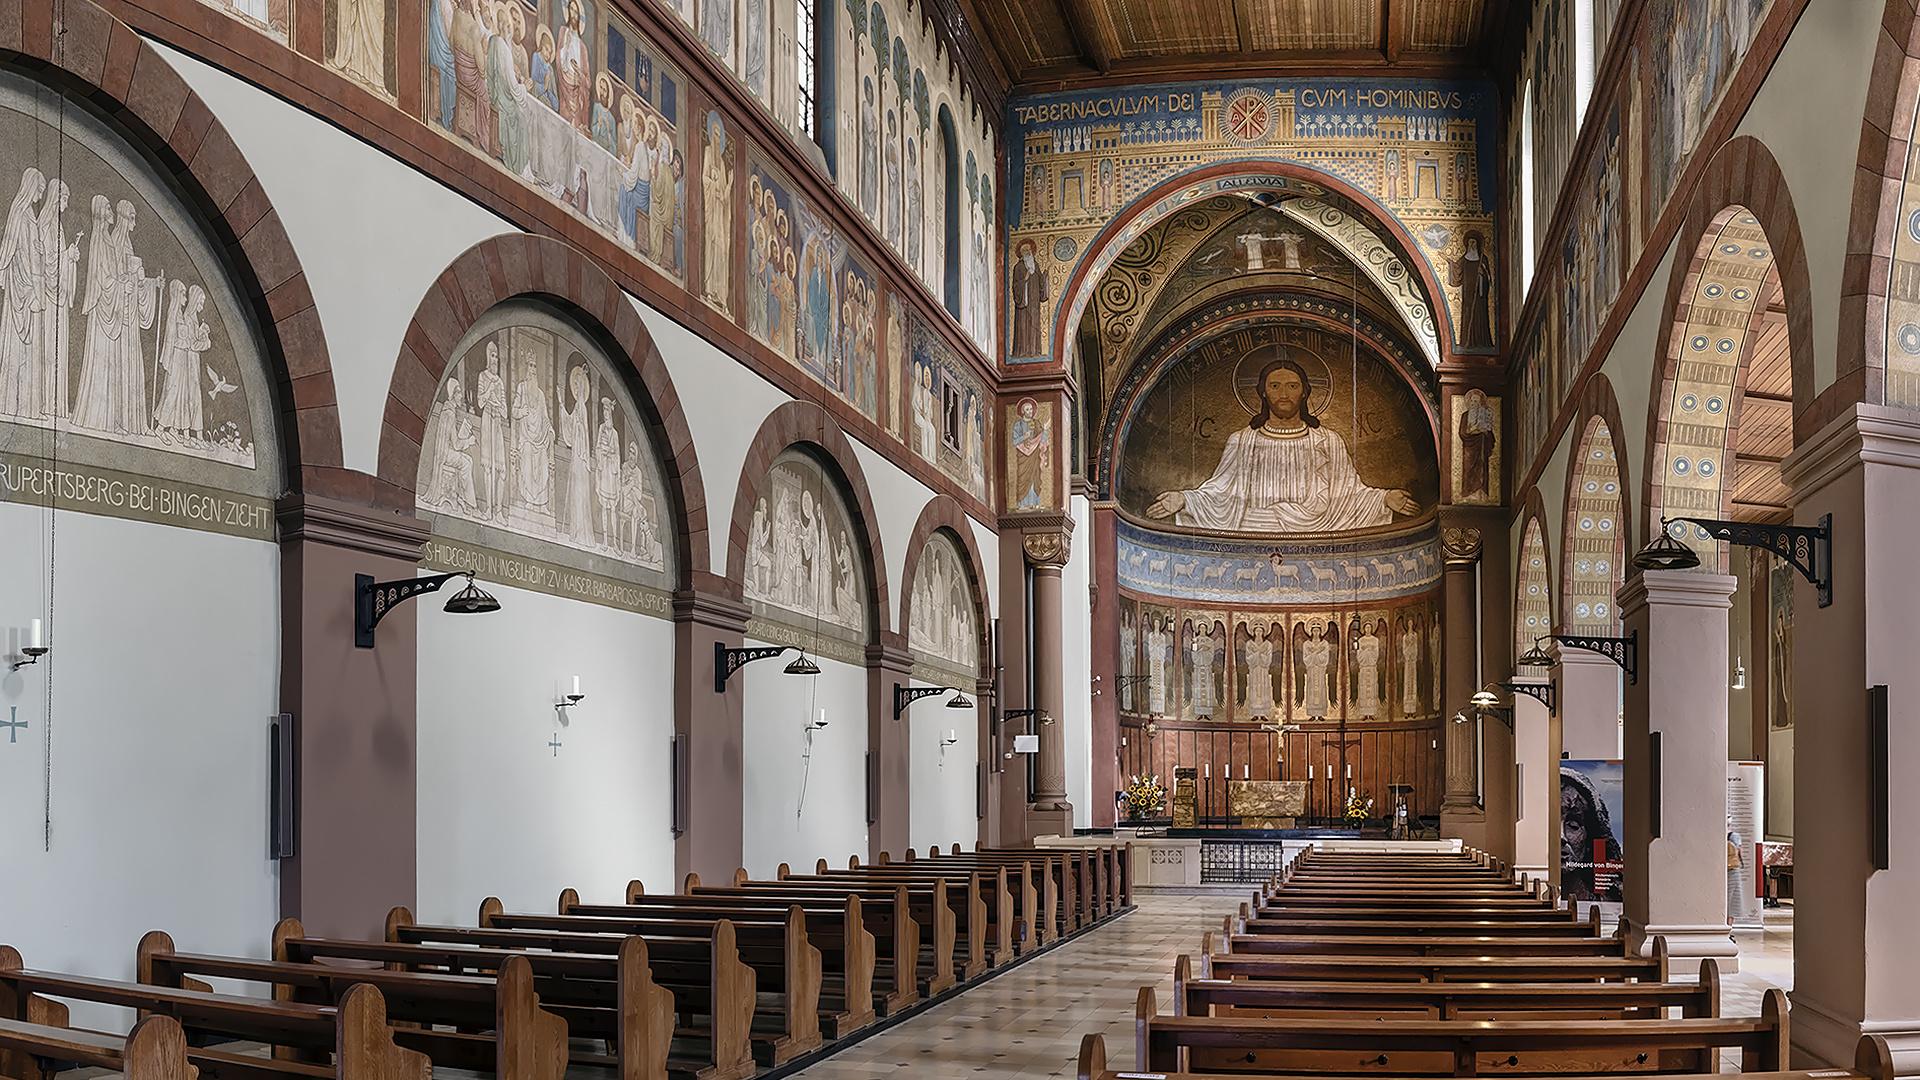 Klosterbasilika SANKT HILDEGARD in Rüdesheim am Rhein